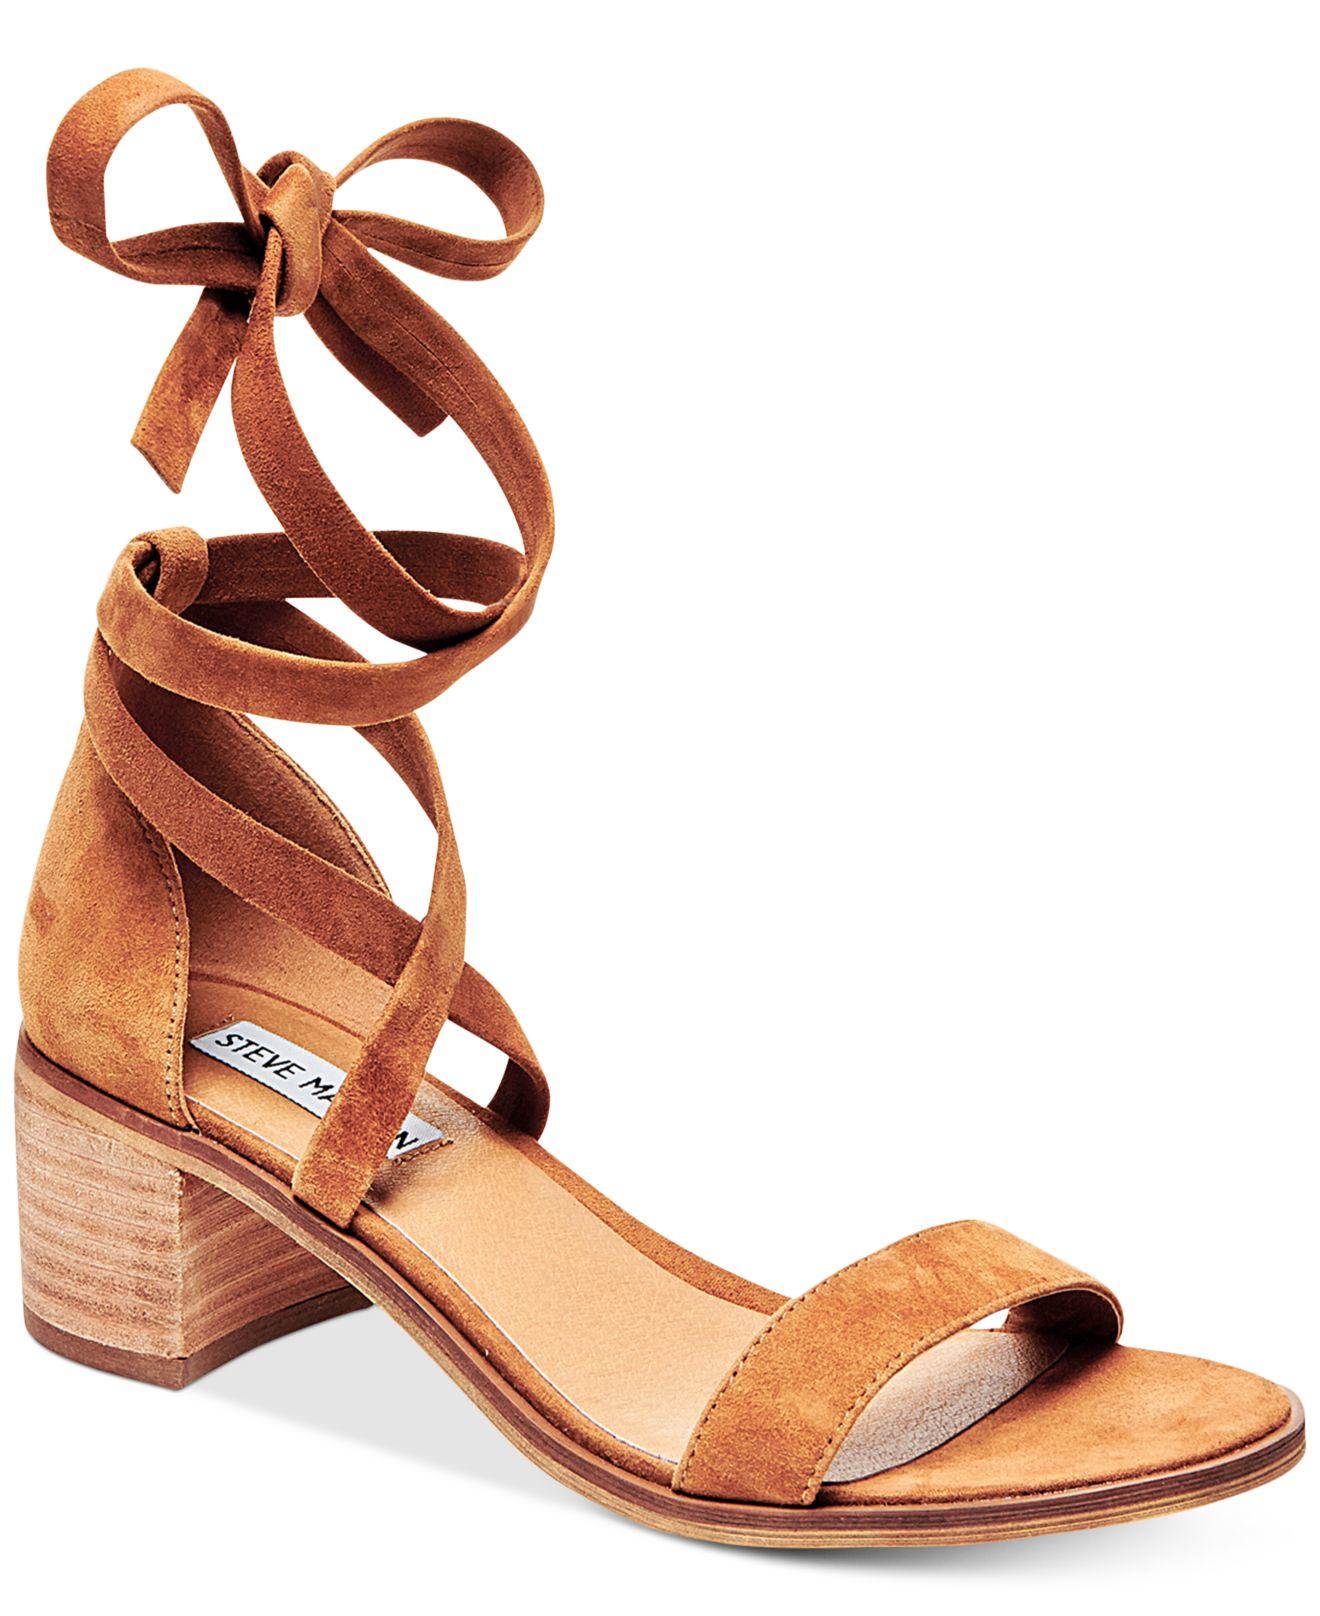 d56d8601c47 Lyst - Steve Madden Women s Rizza Lace-up Block-heel Sandals